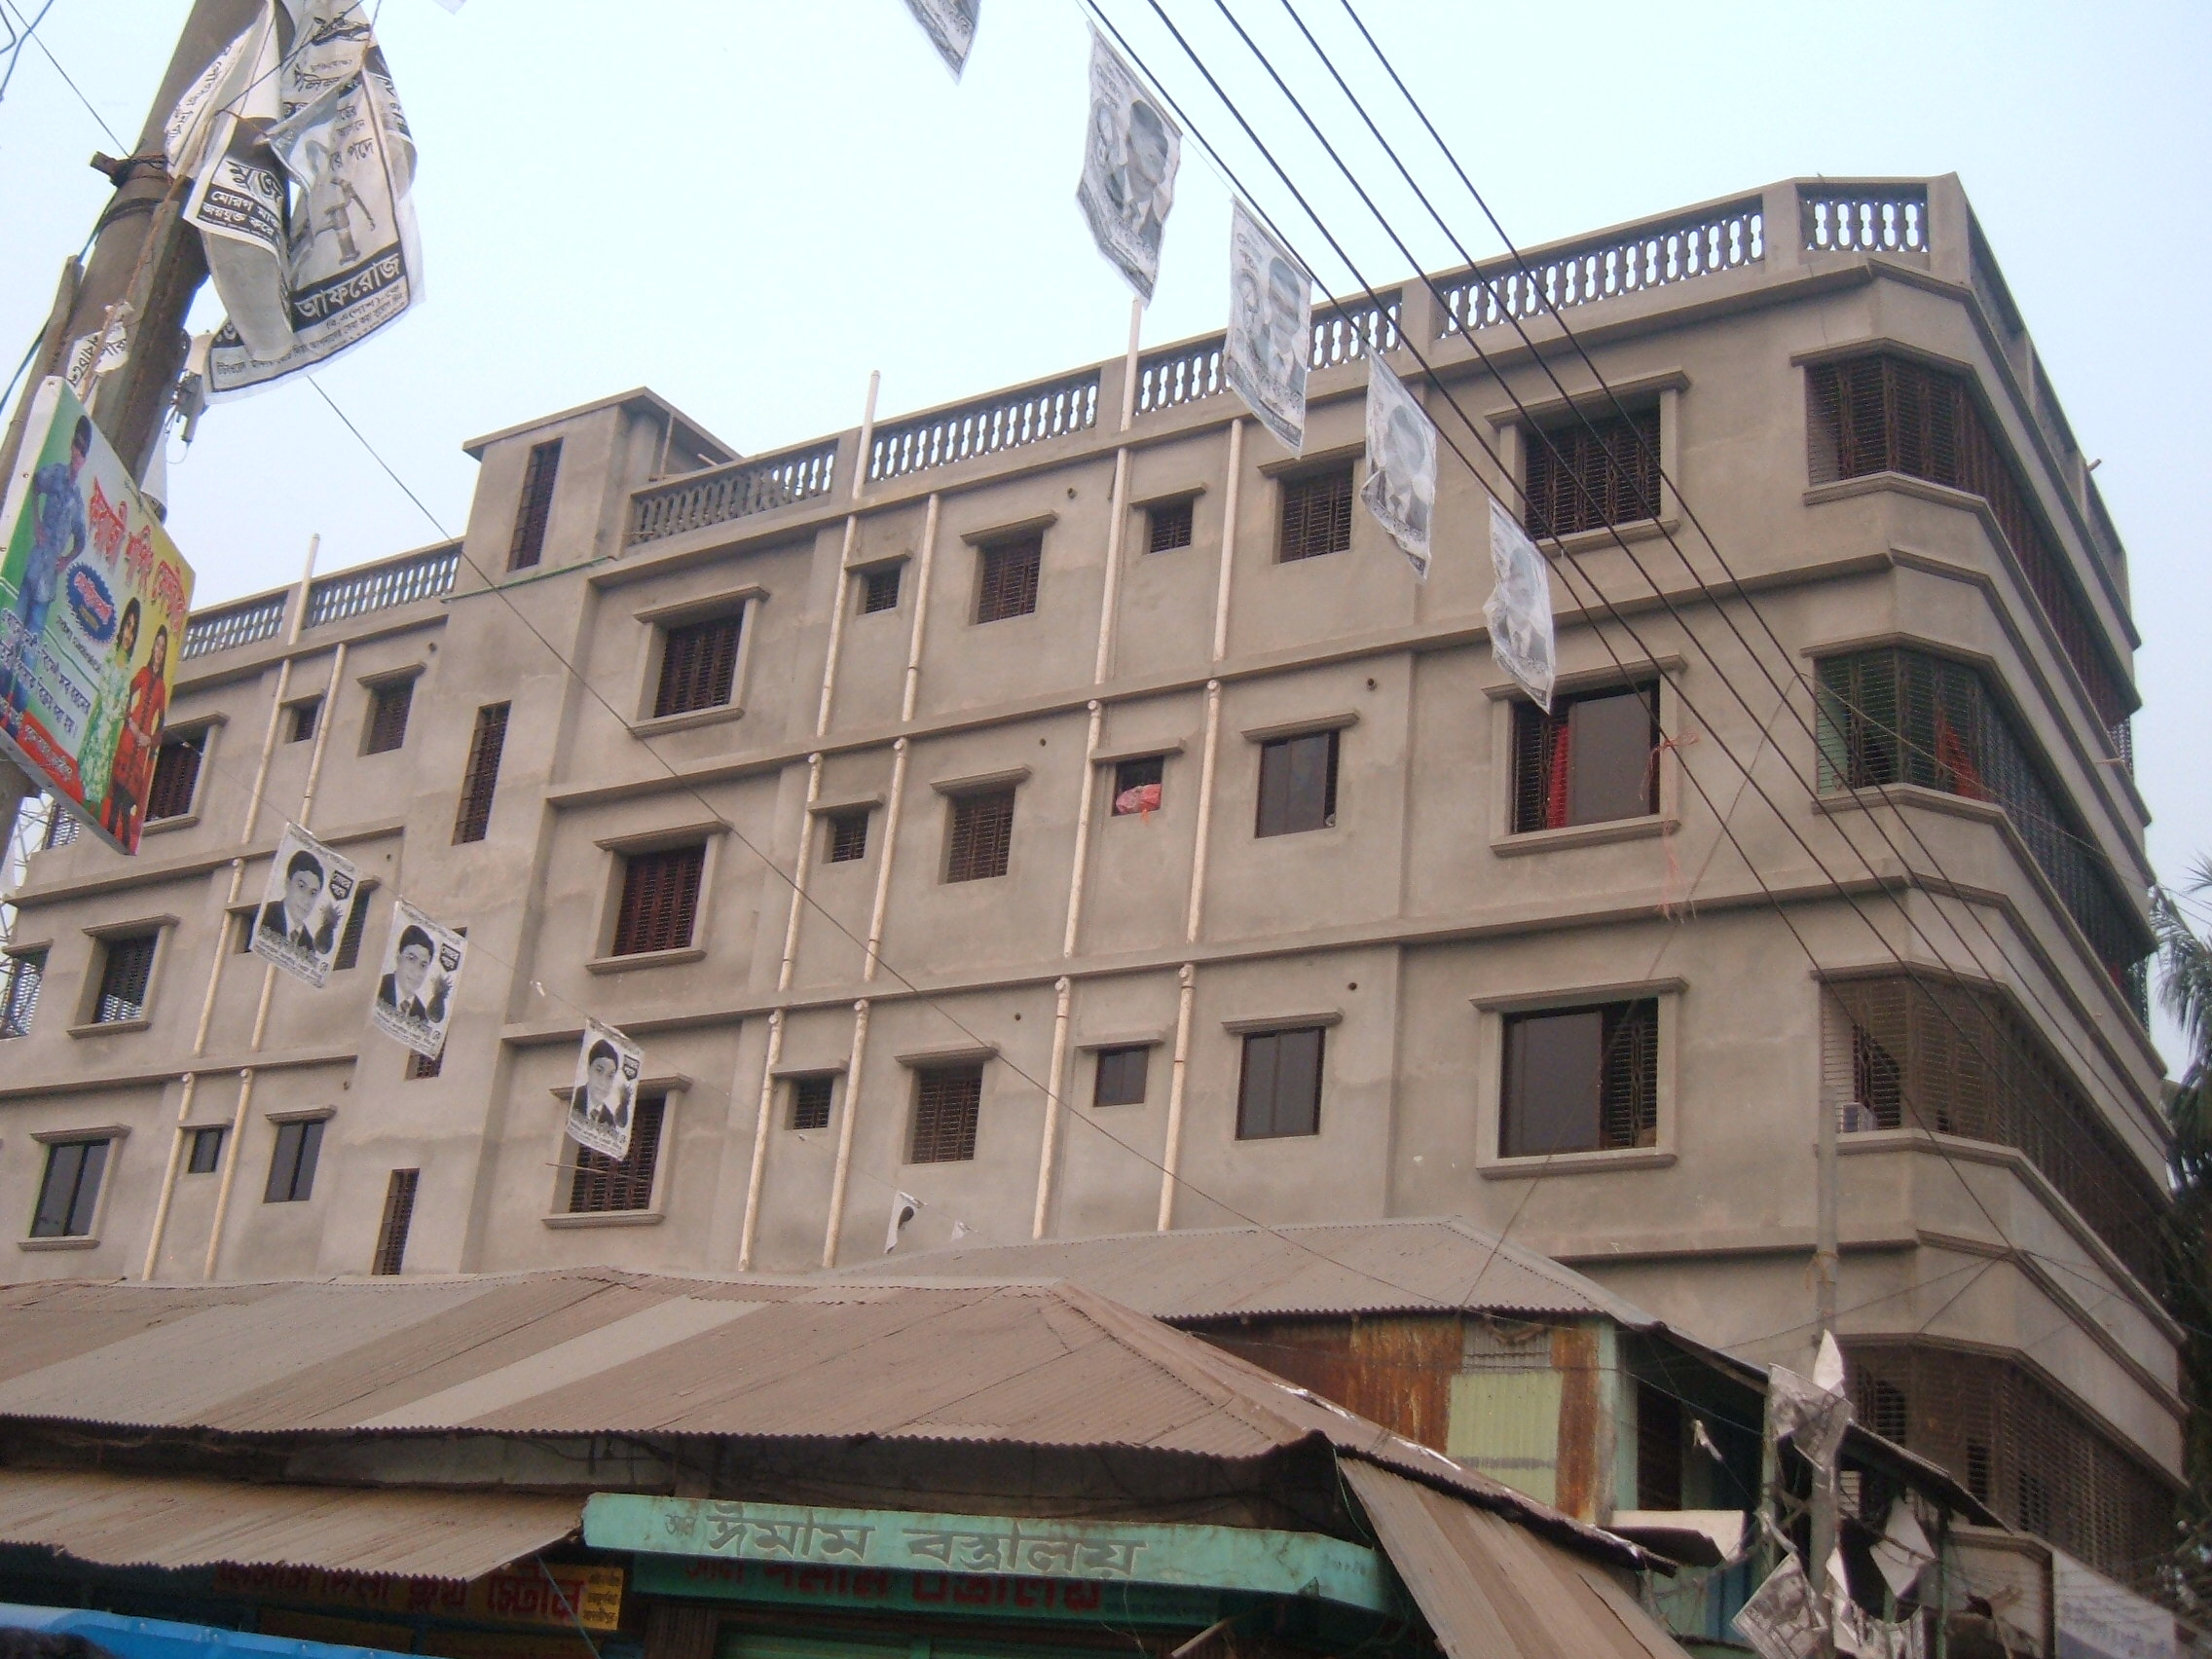 Dal bangladesh al bidesh dialoghi mediterranei for Casa costruita